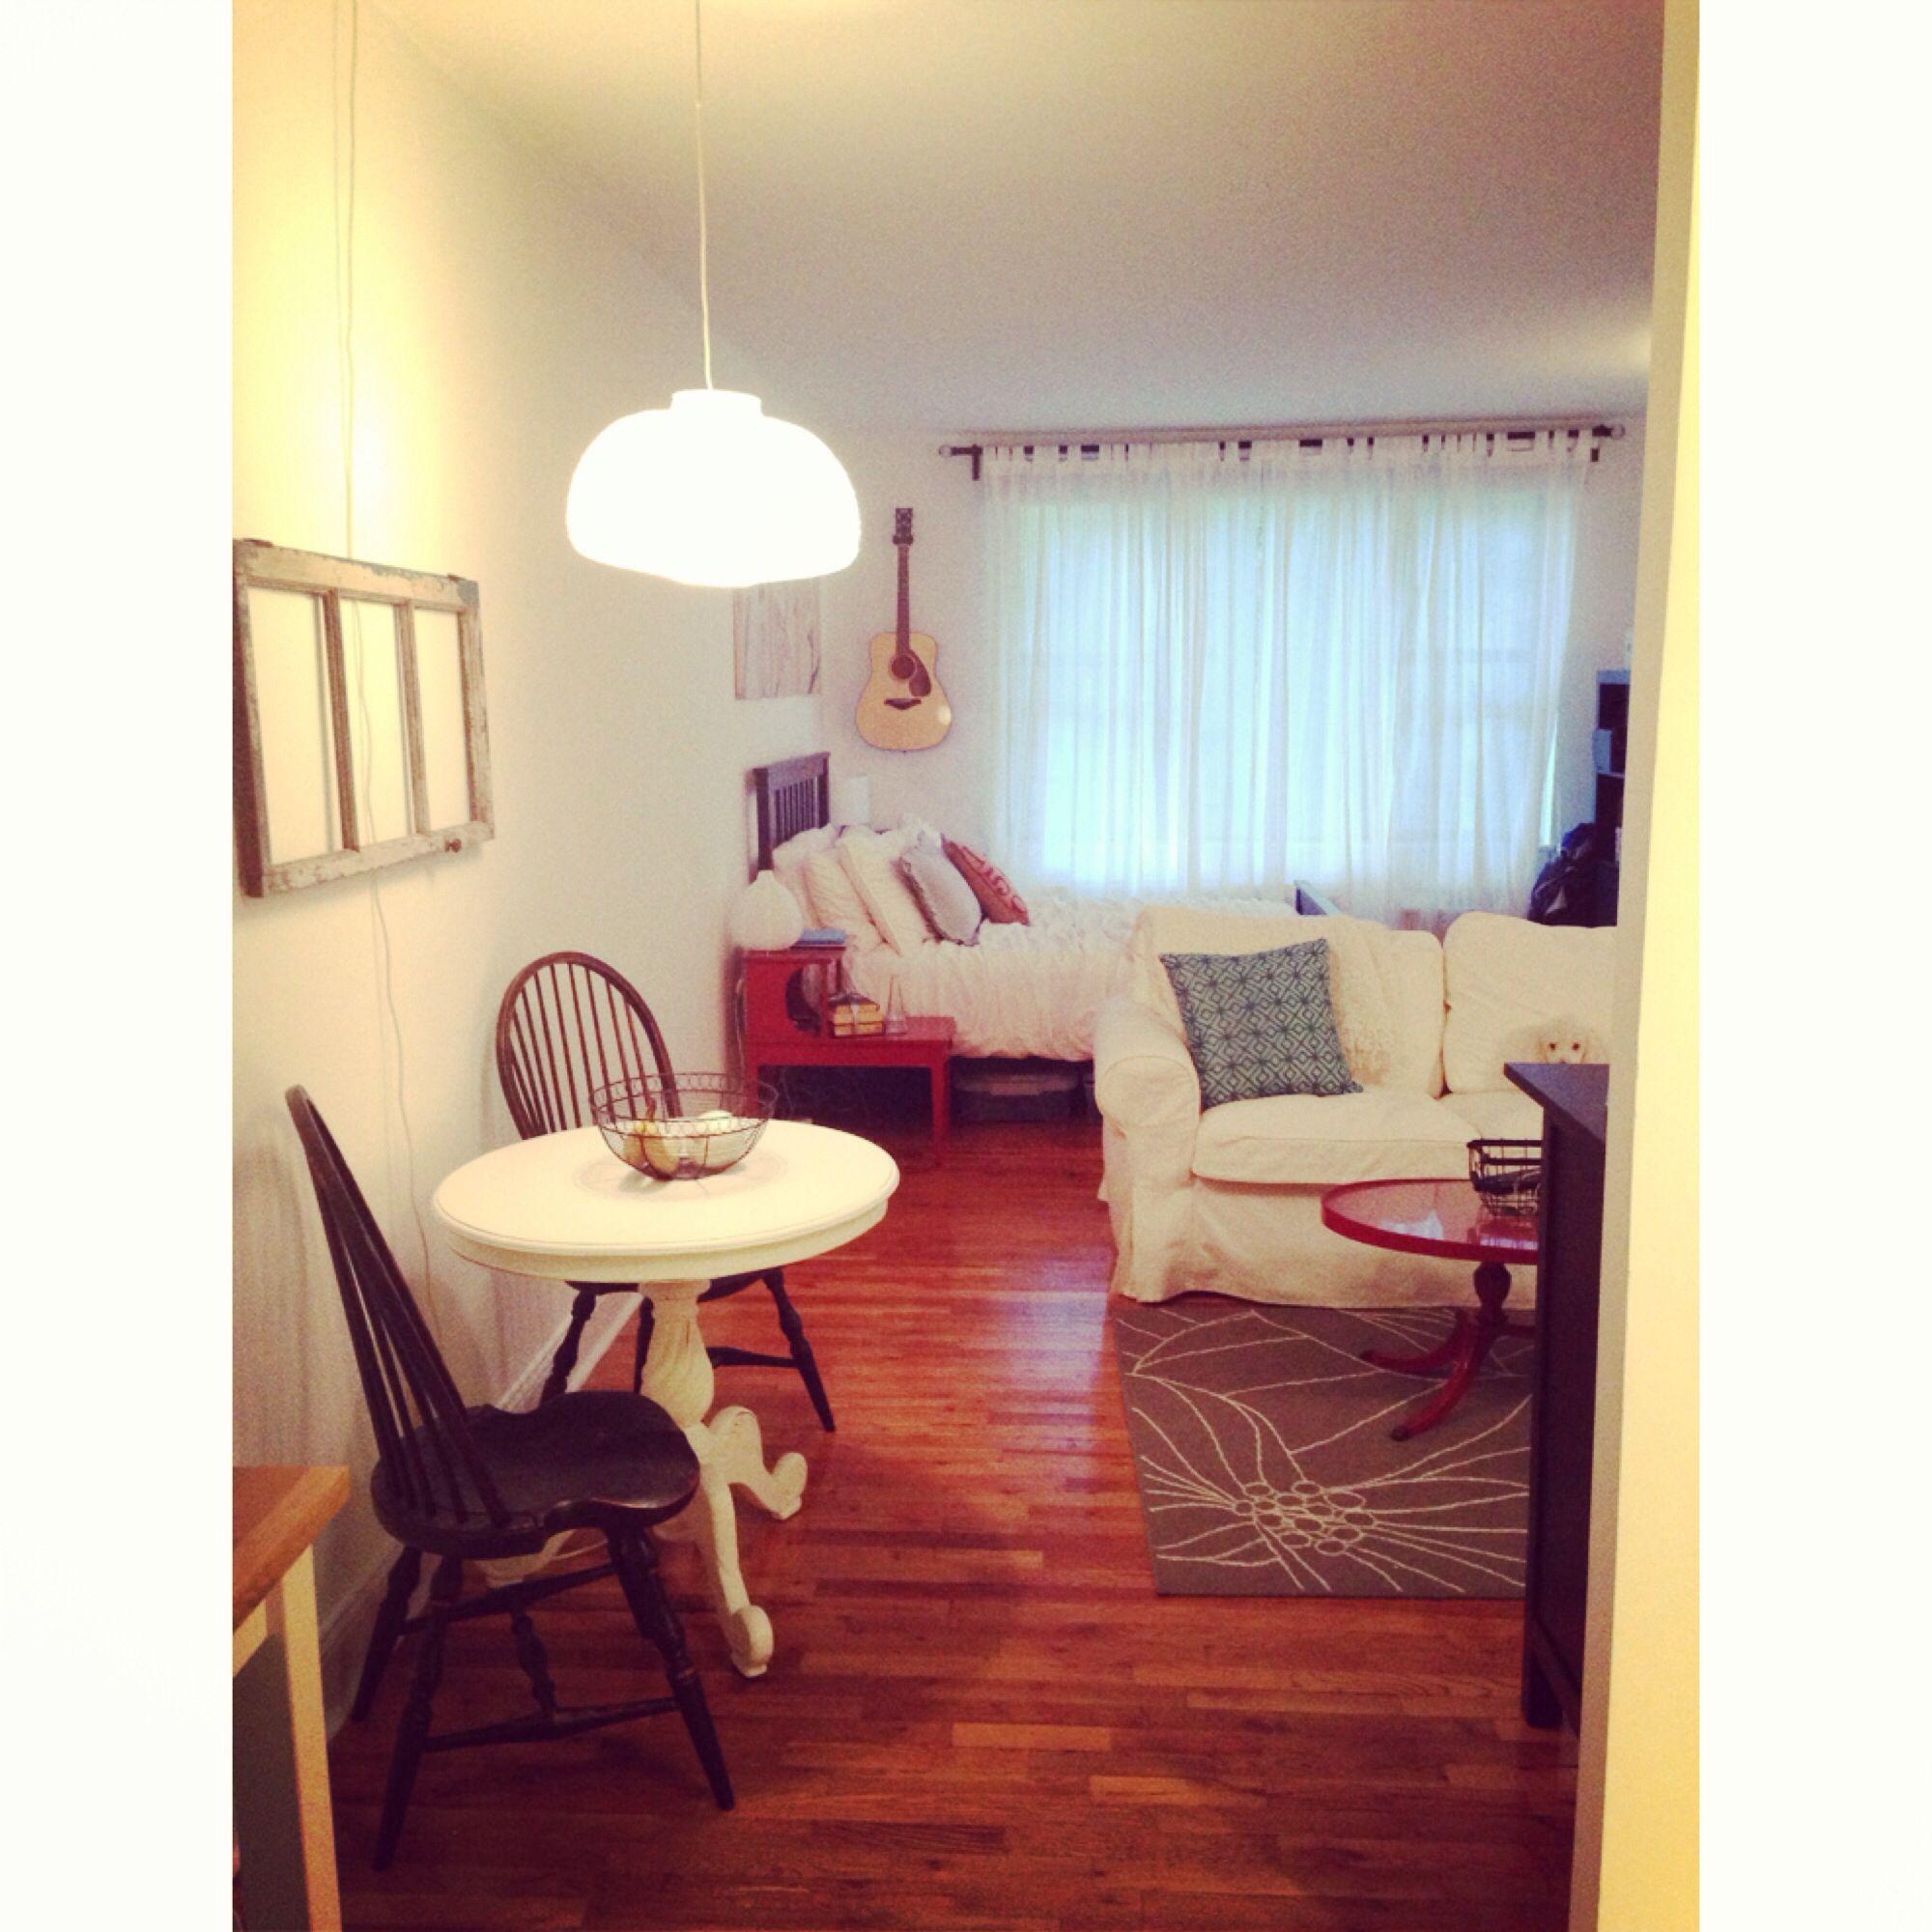 New York Studio Apartments: My Studio Apartment In New York!